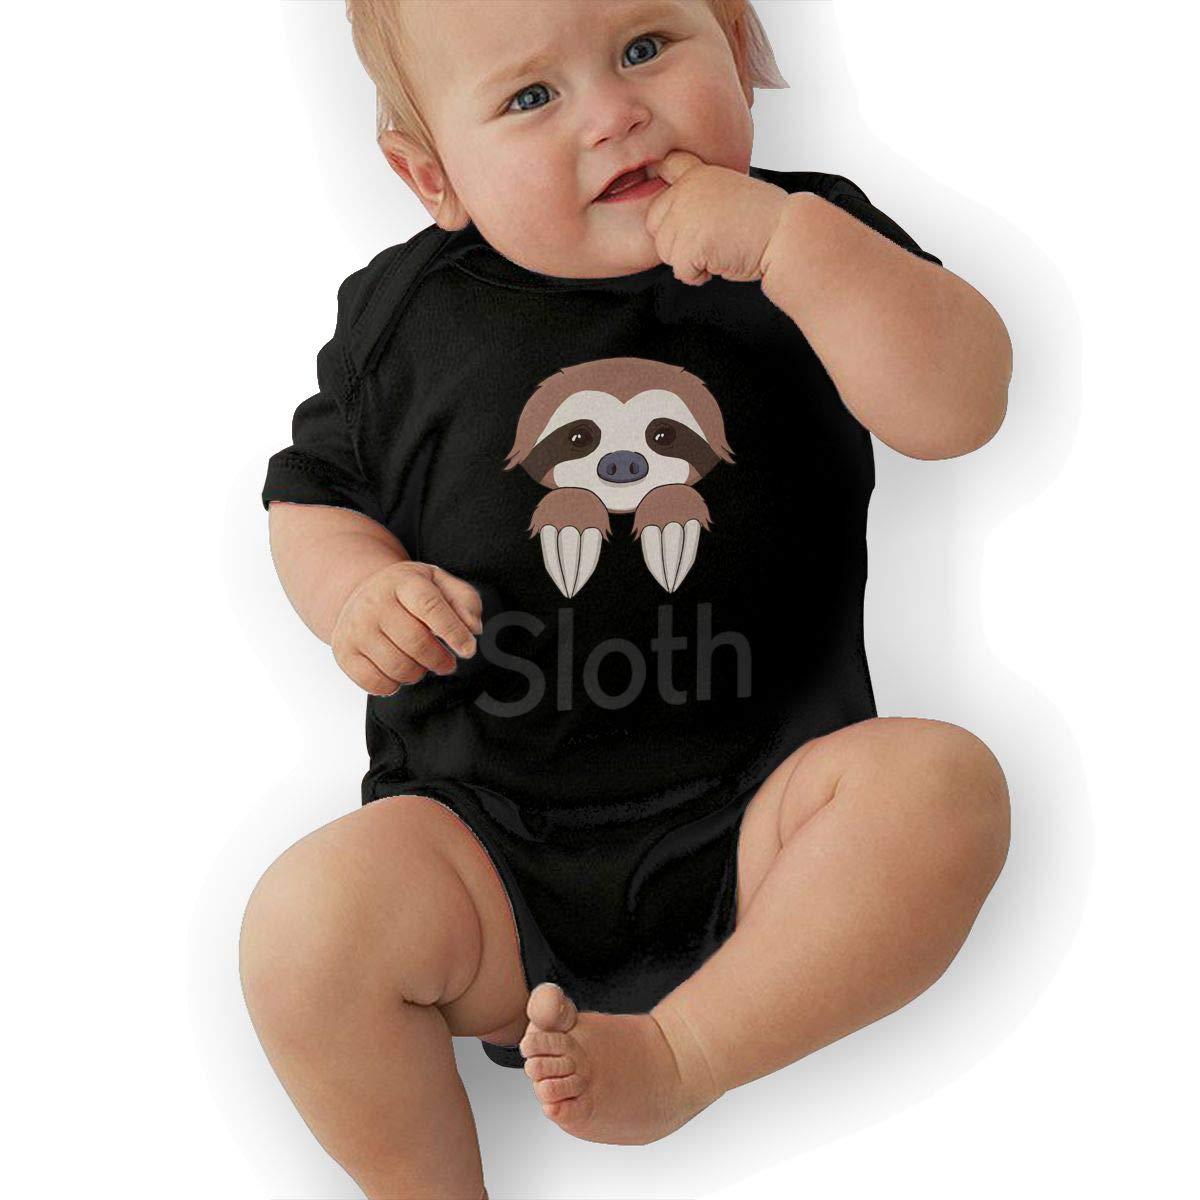 Dfenere Sloth Fashion Newborn Baby Short Sleeve Bodysuit Romper Infant Summer Clothing